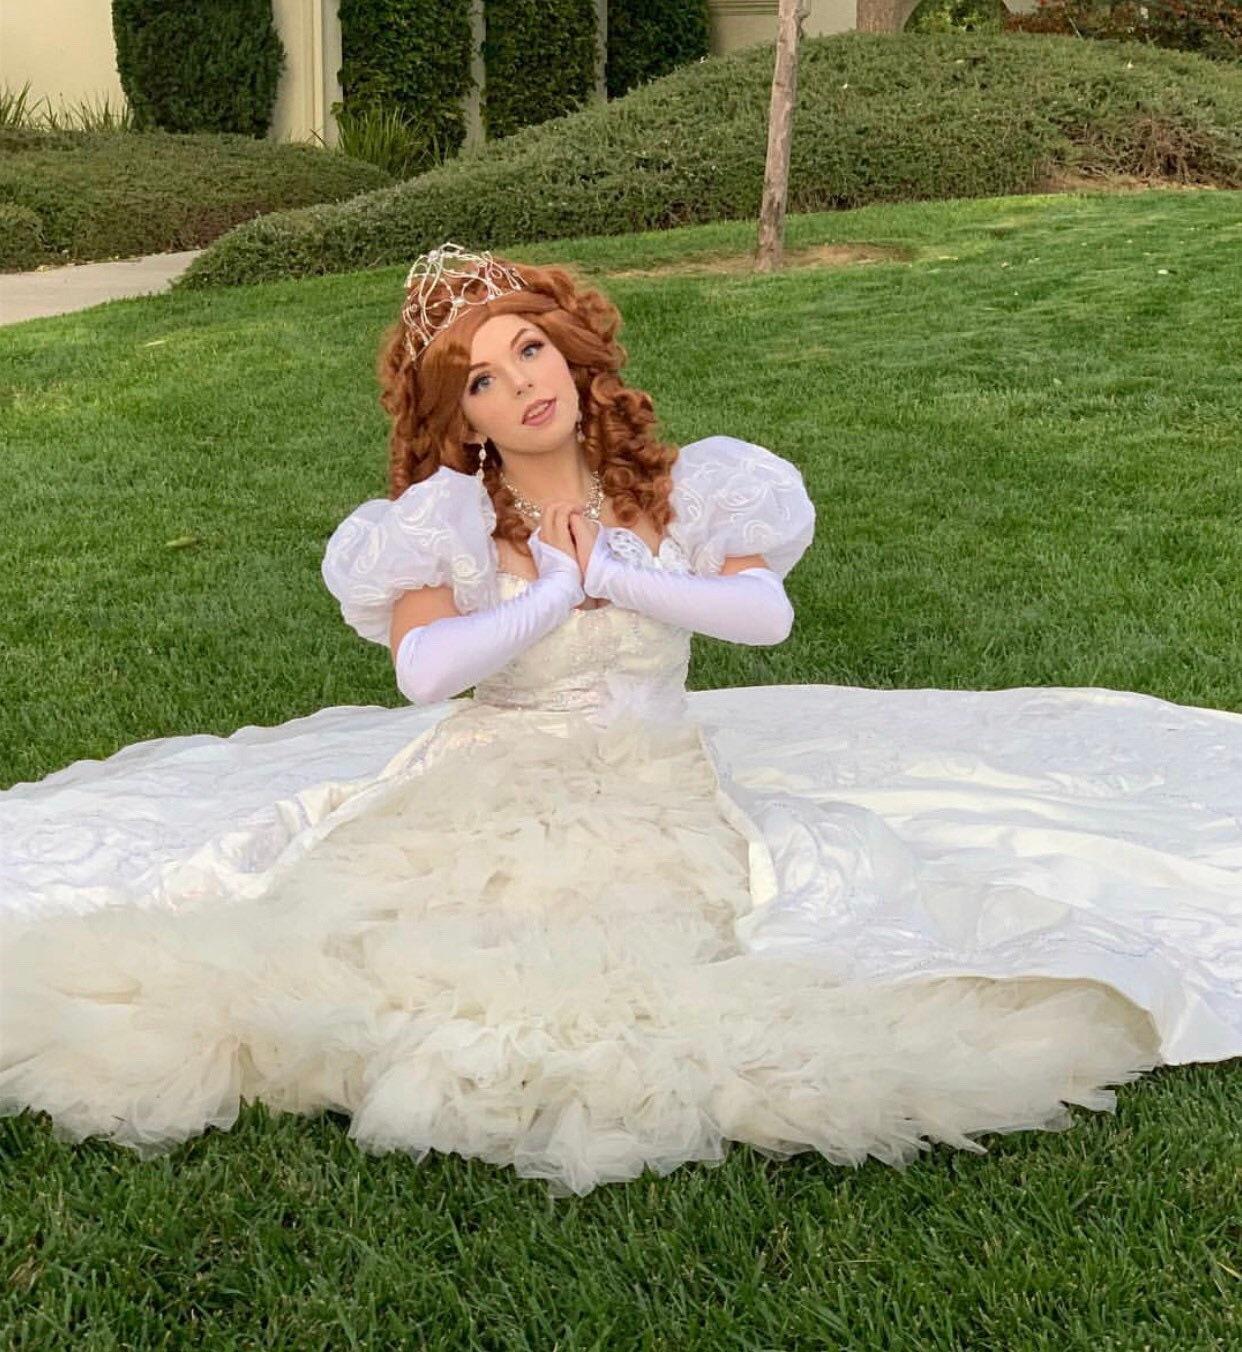 50: Enchanted Giselle Wedding Dress Art At Websimilar.org